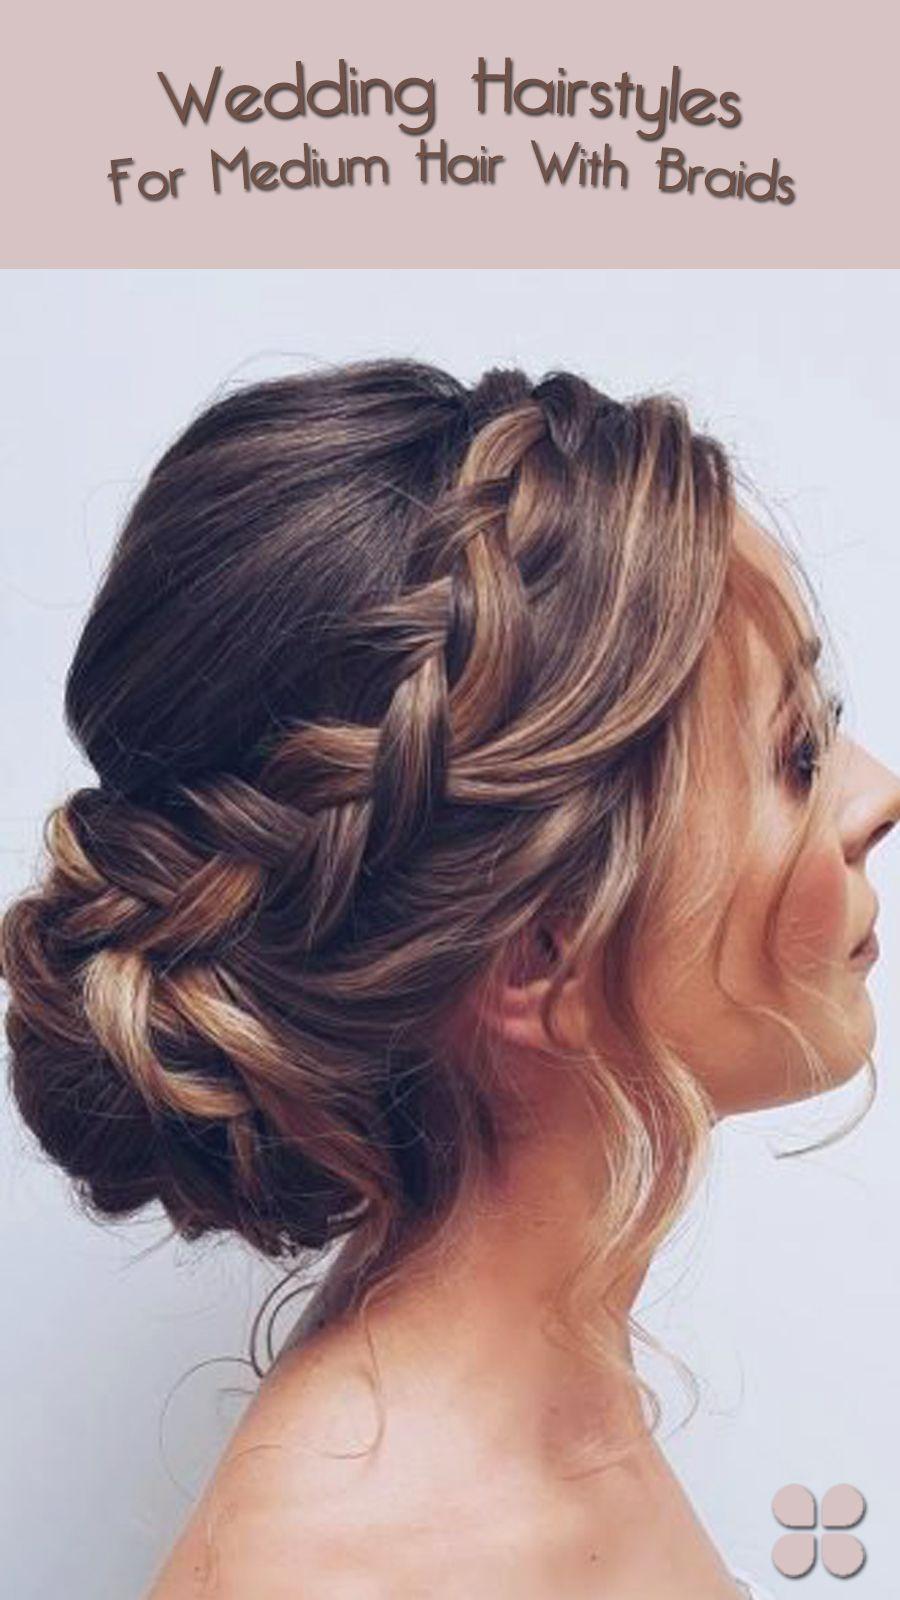 Gorgeous Wedding Hairstyle Ideas for Medium Hair